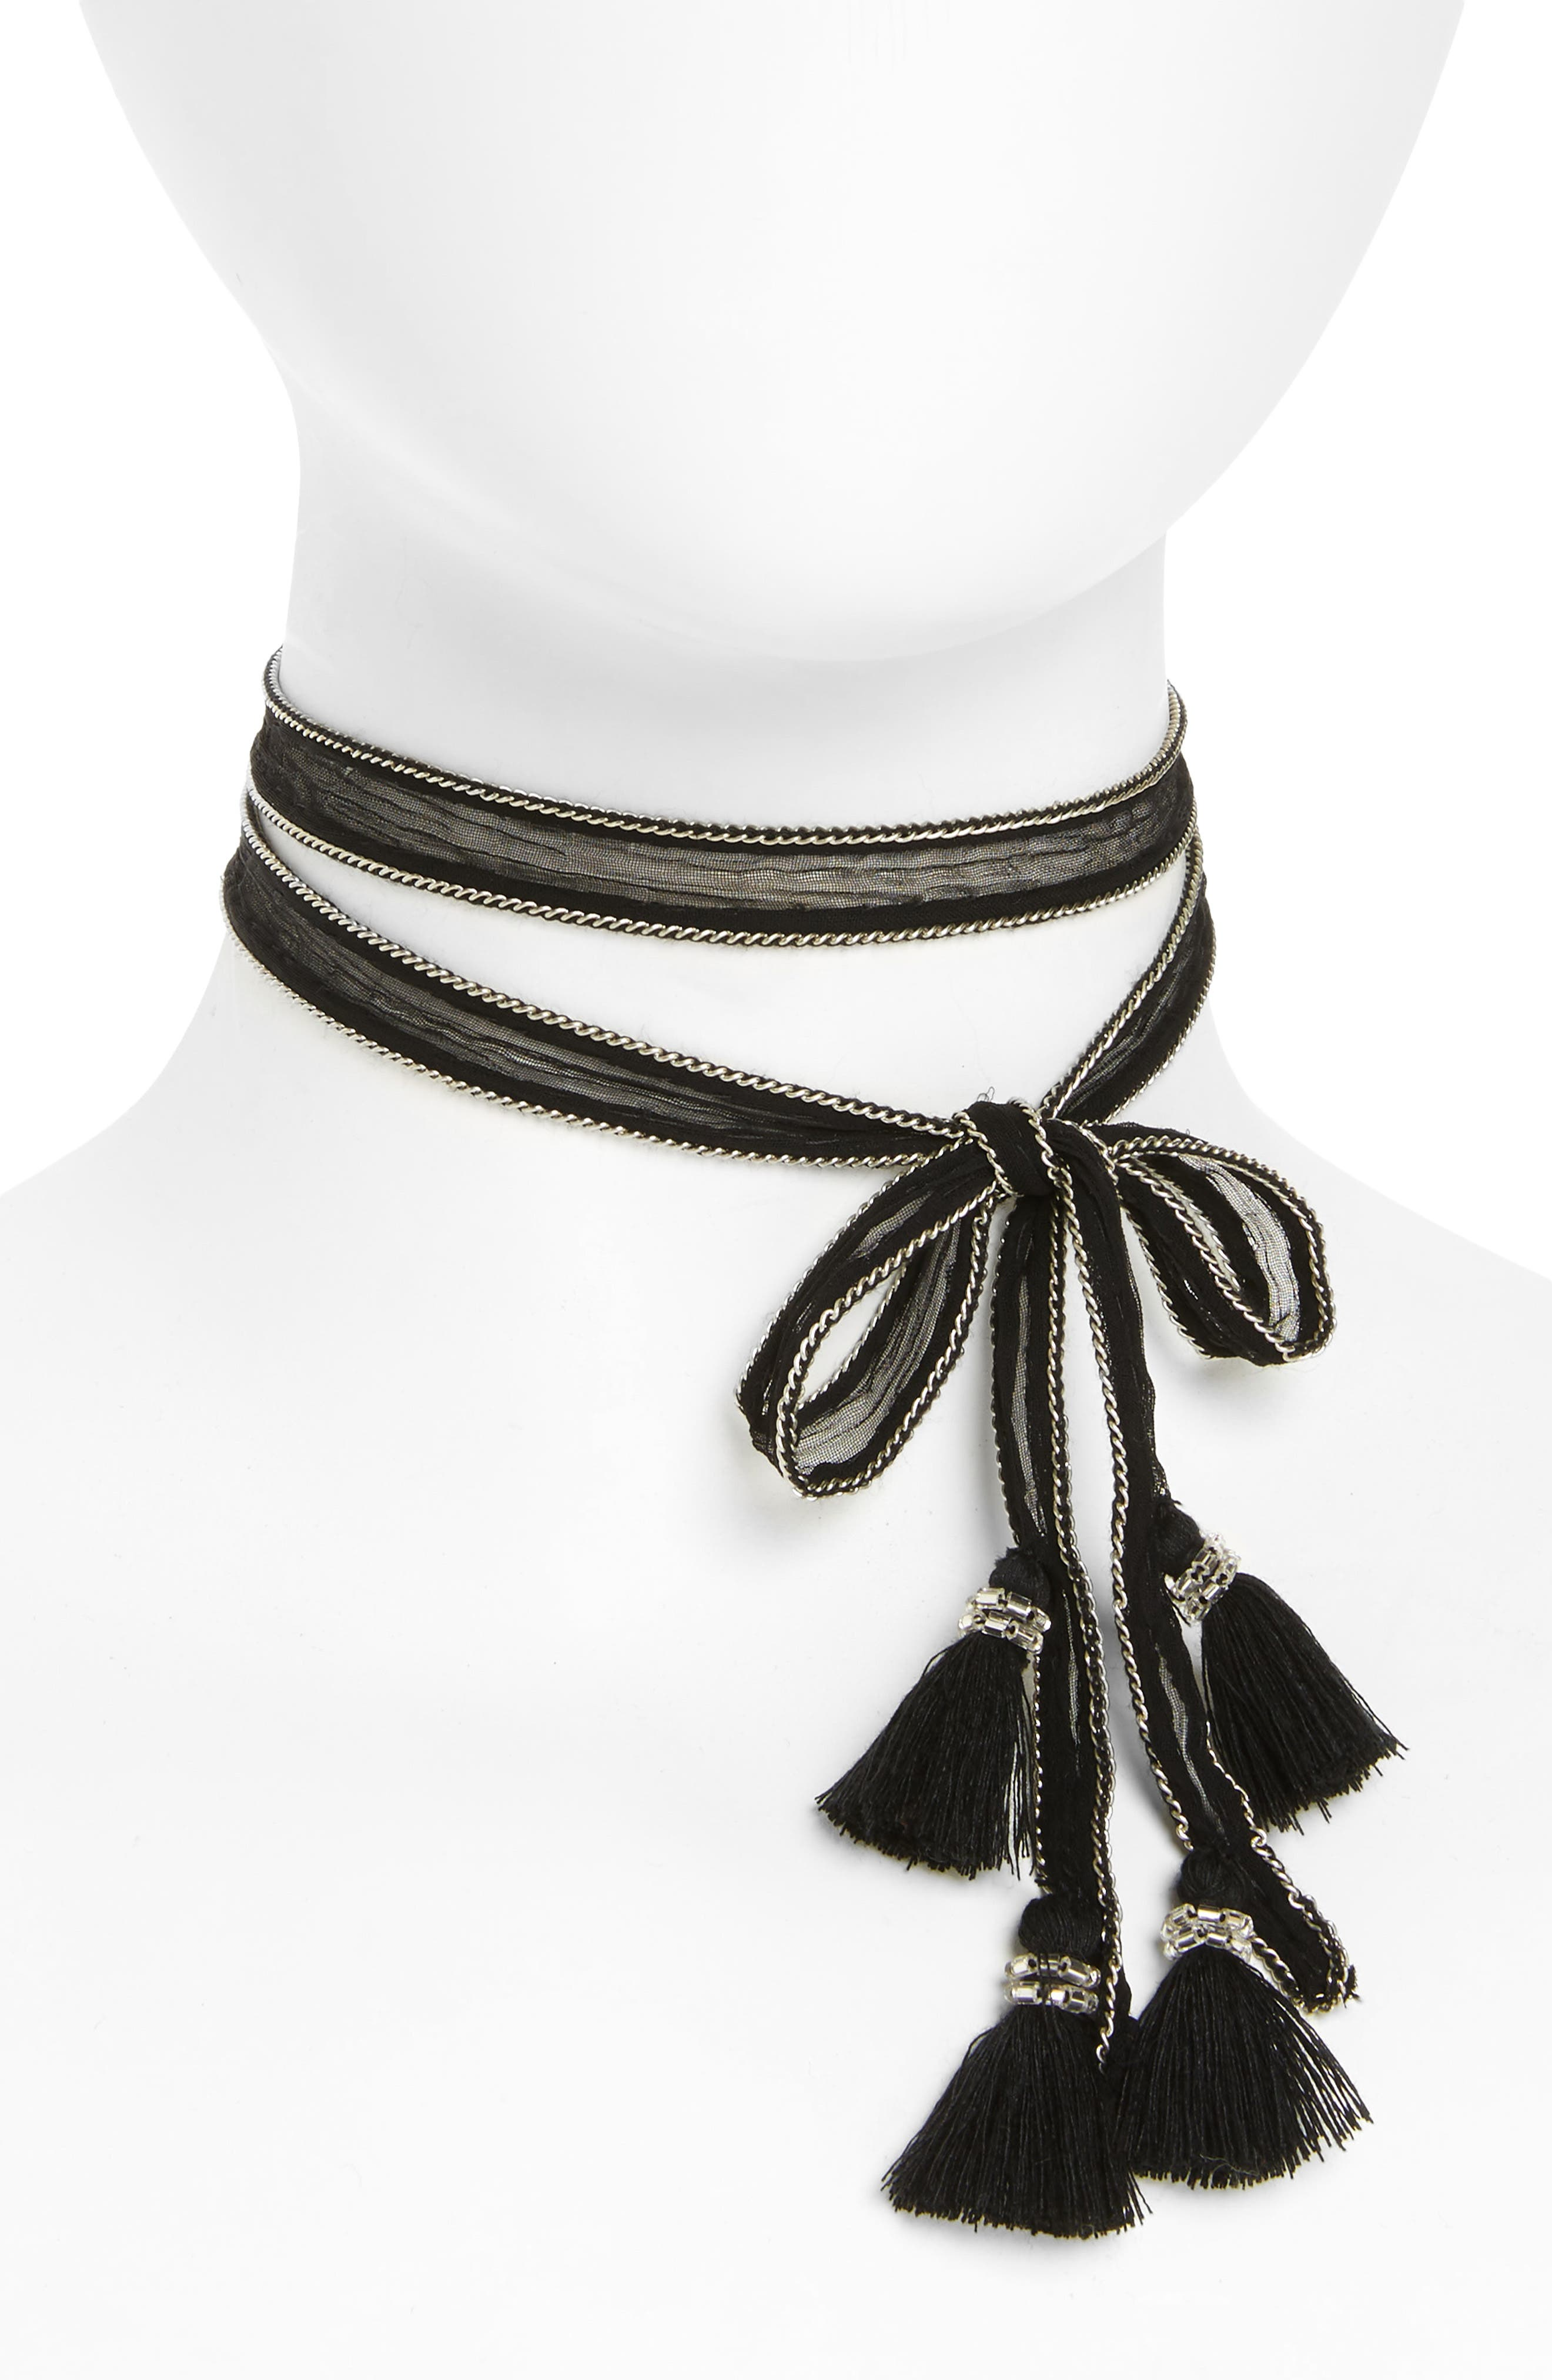 Chan Luu Chiffon Tie Necklace